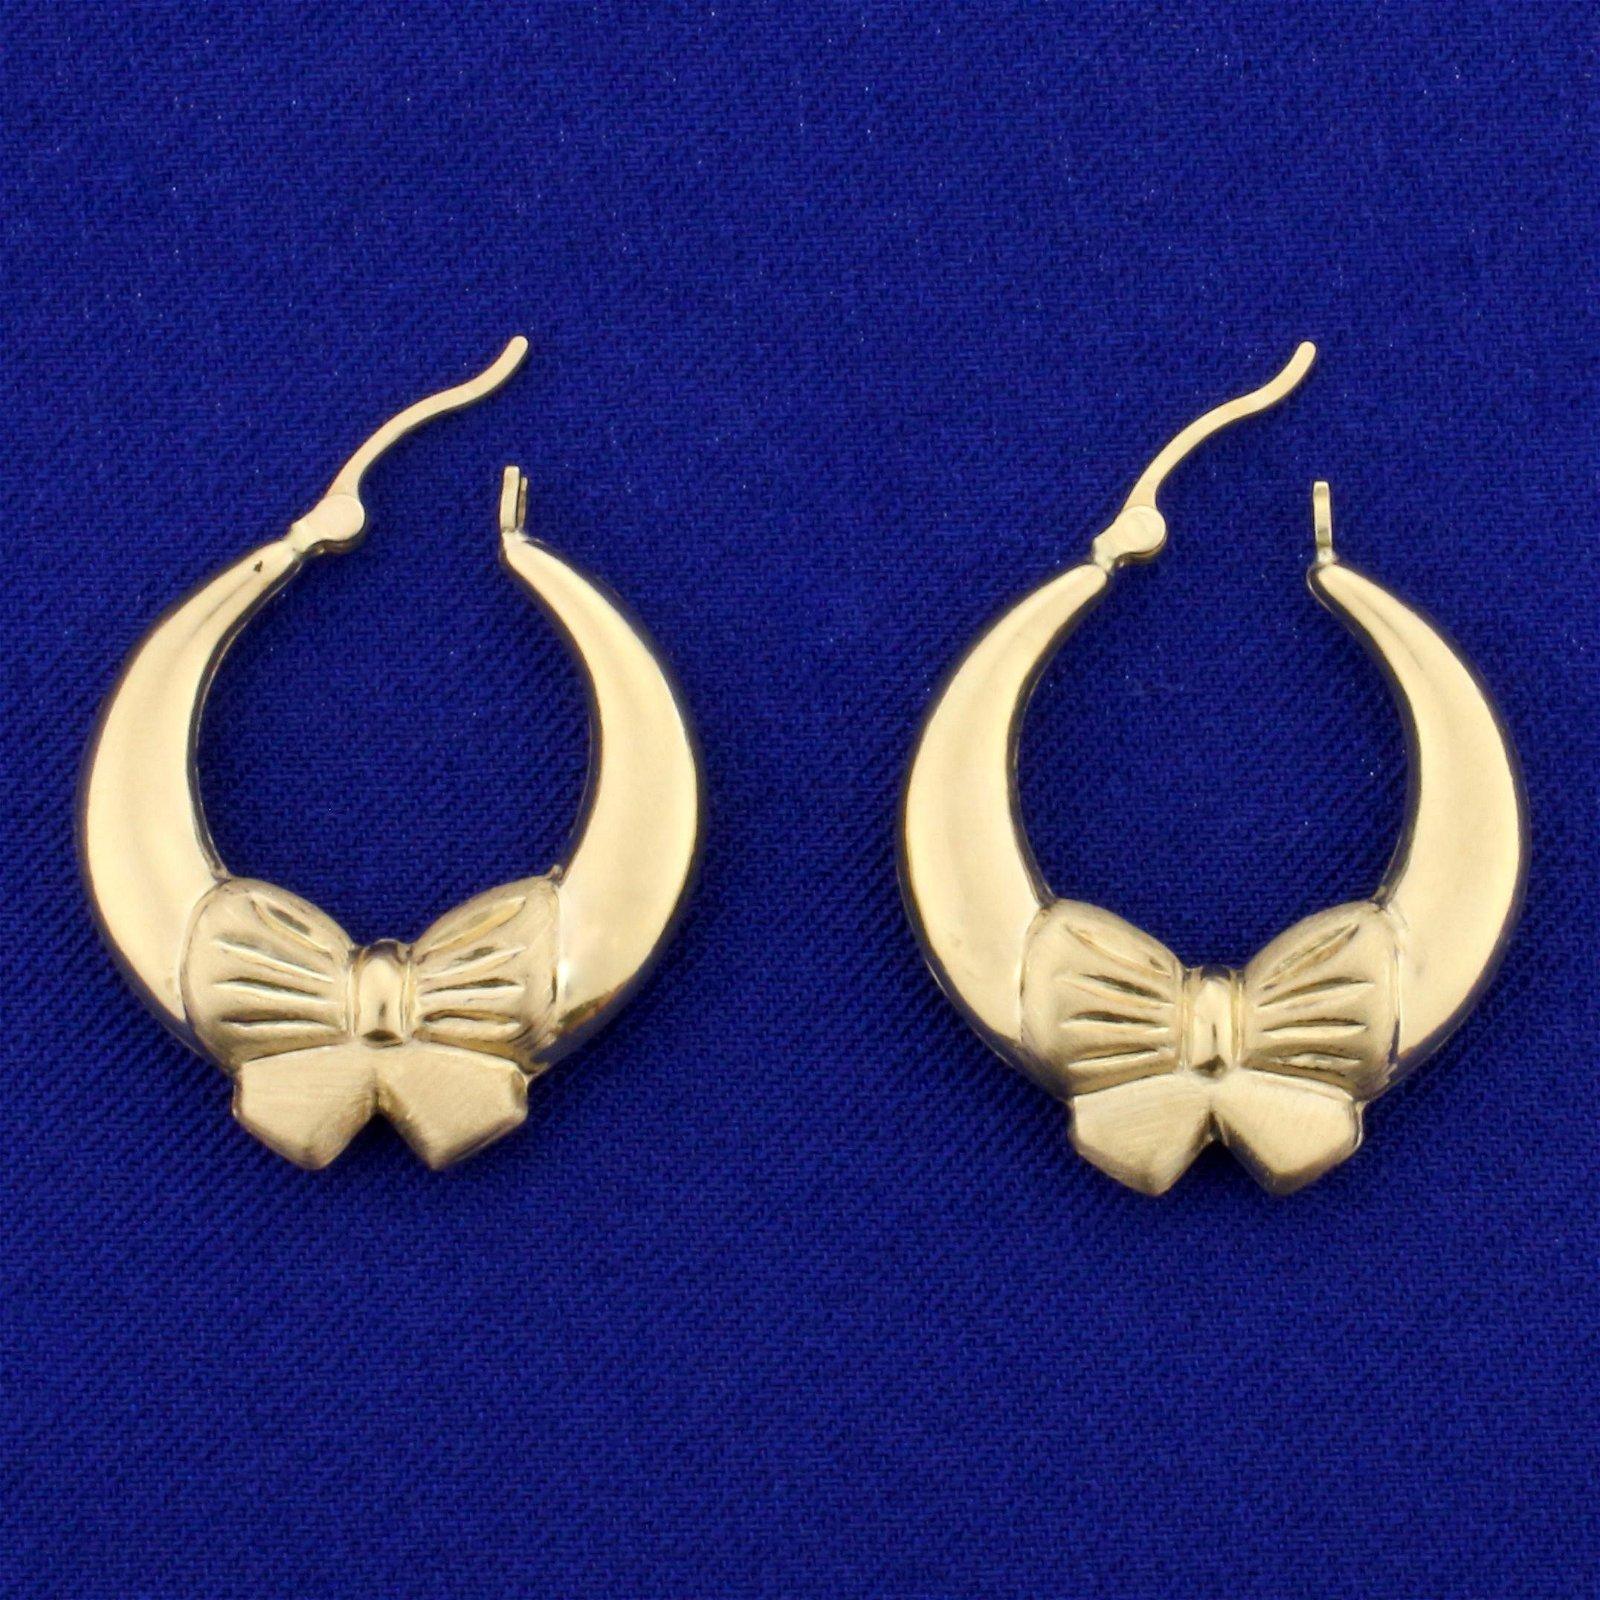 Bow Design Hoop Earrings in 14K Yellow Gold